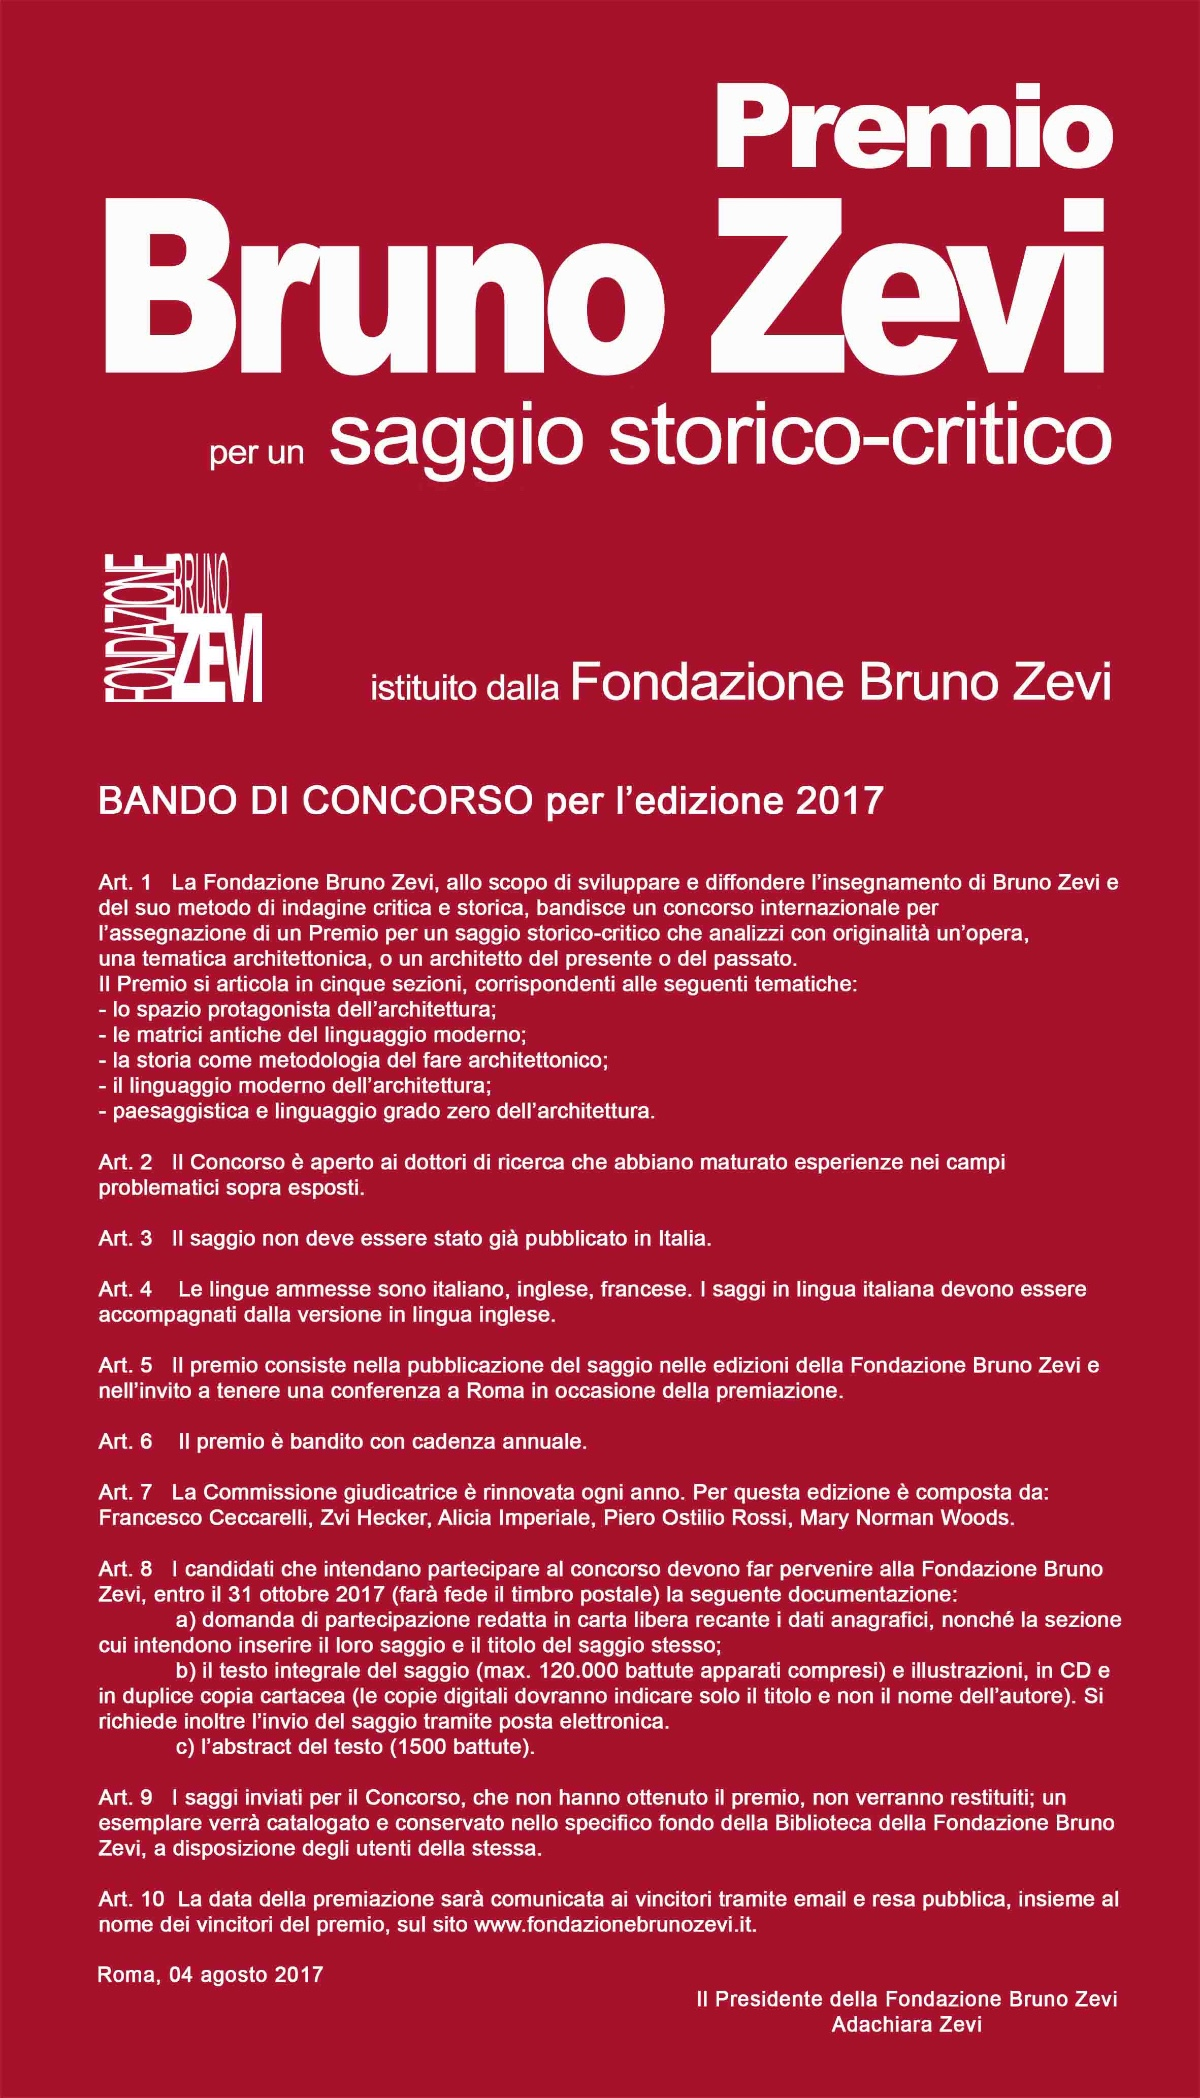 Premio Bruno Zevi 2017